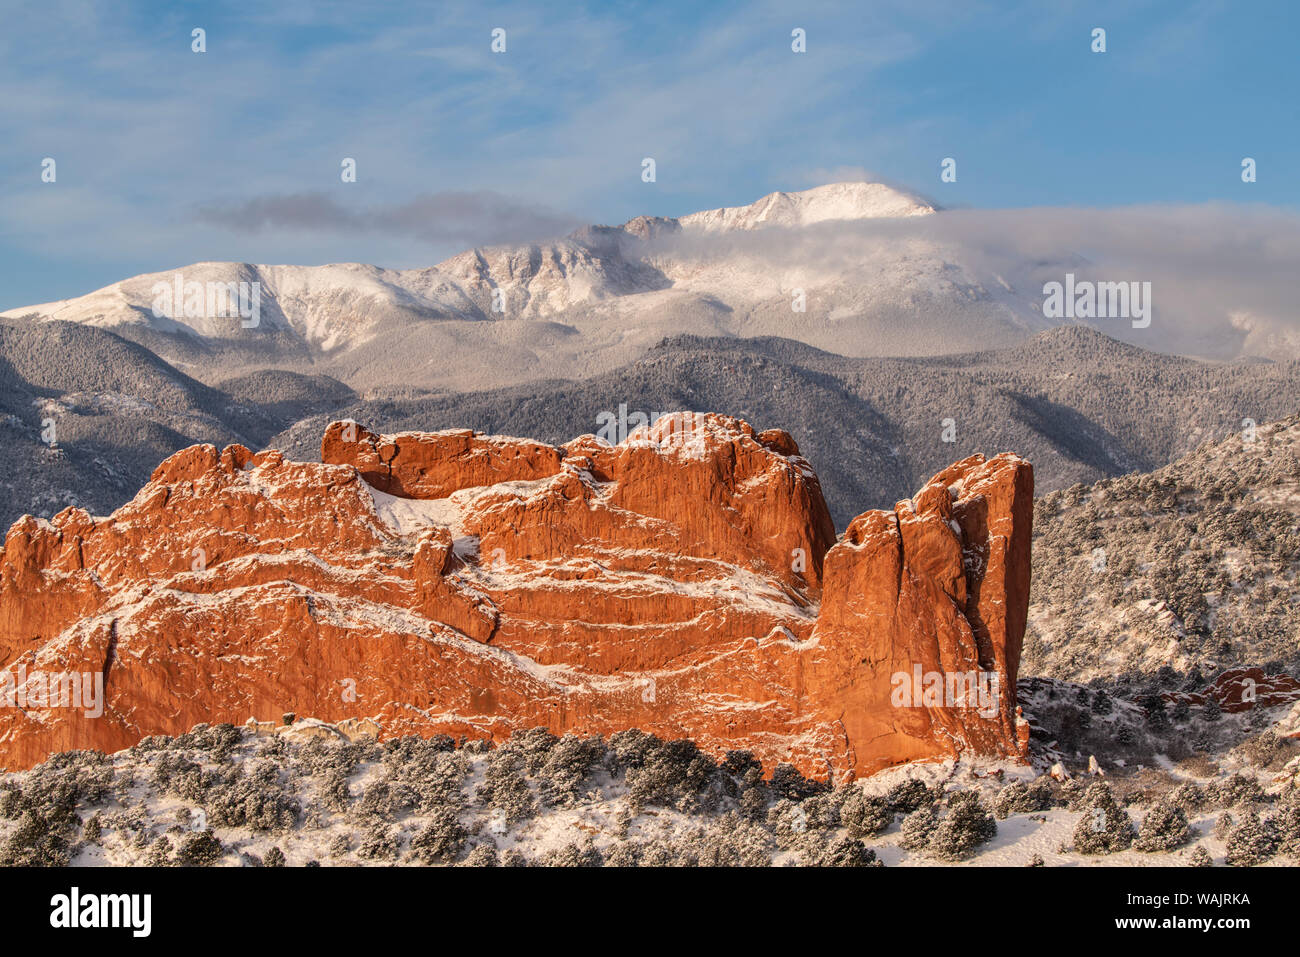 USA, Colorado, Garden of the Gods. Fresh snow on Pikes Peak